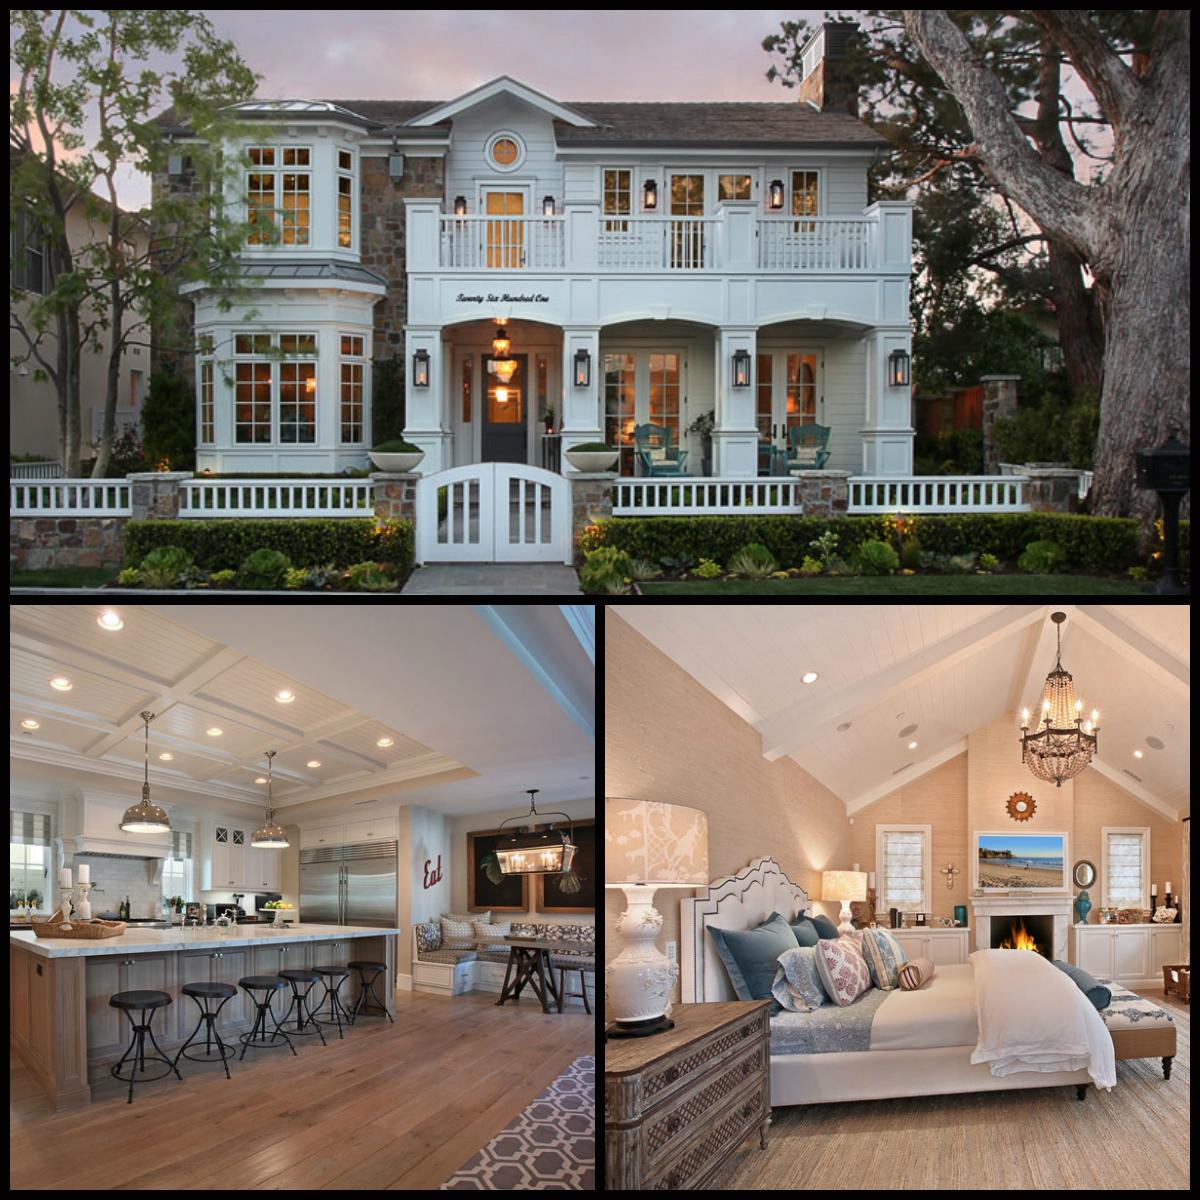 Ciao newport beach 5 gorgeous homes in newport beach for California home decor